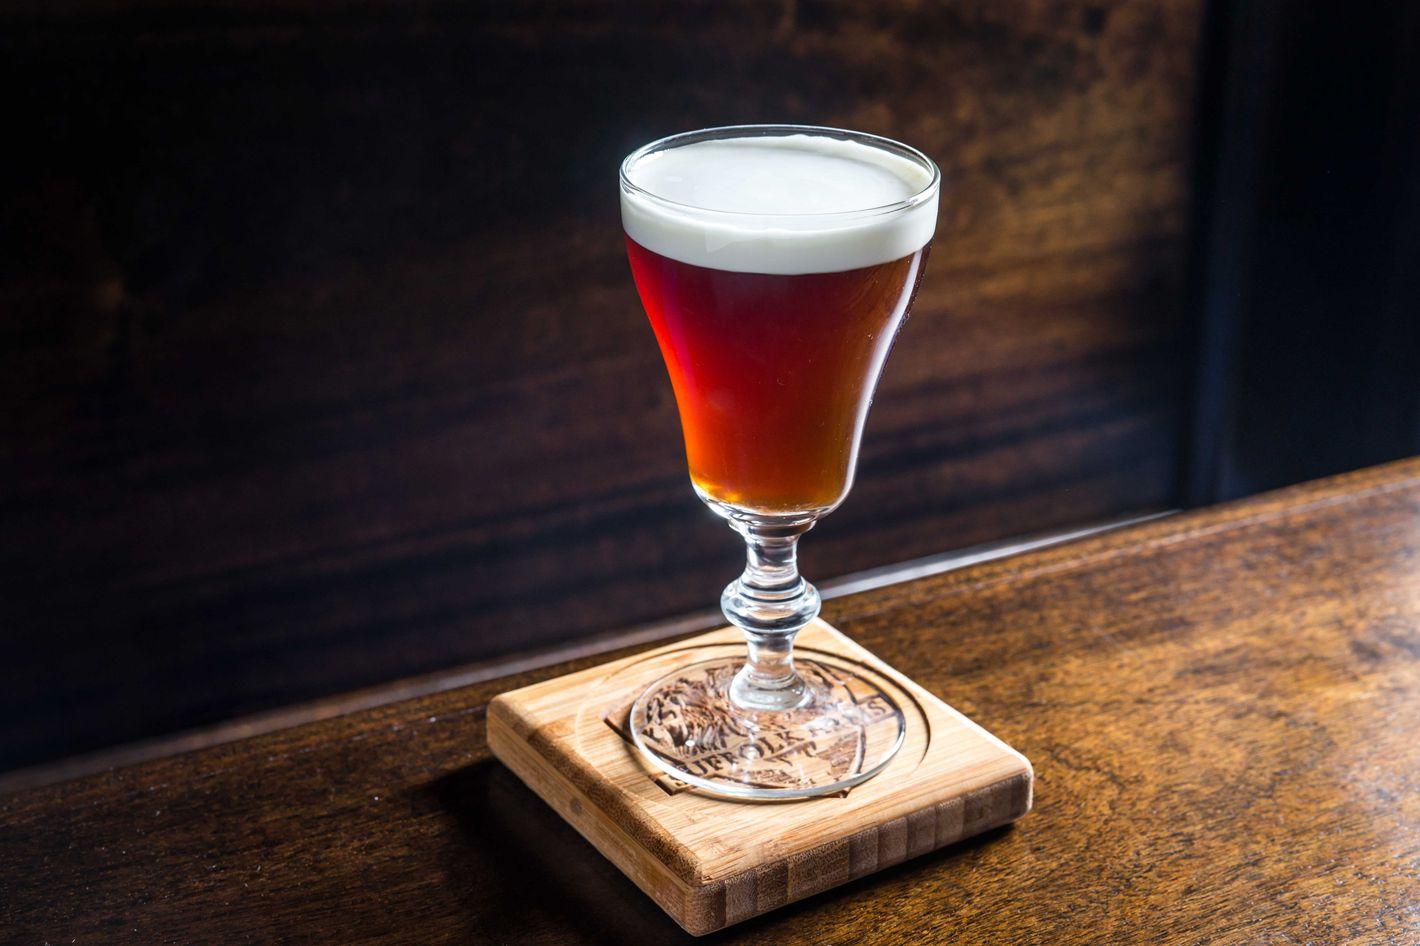 The Duke of Suffolk: Hendrick's gin, Earl Grey and English breakfast tea, cream, and sugar.